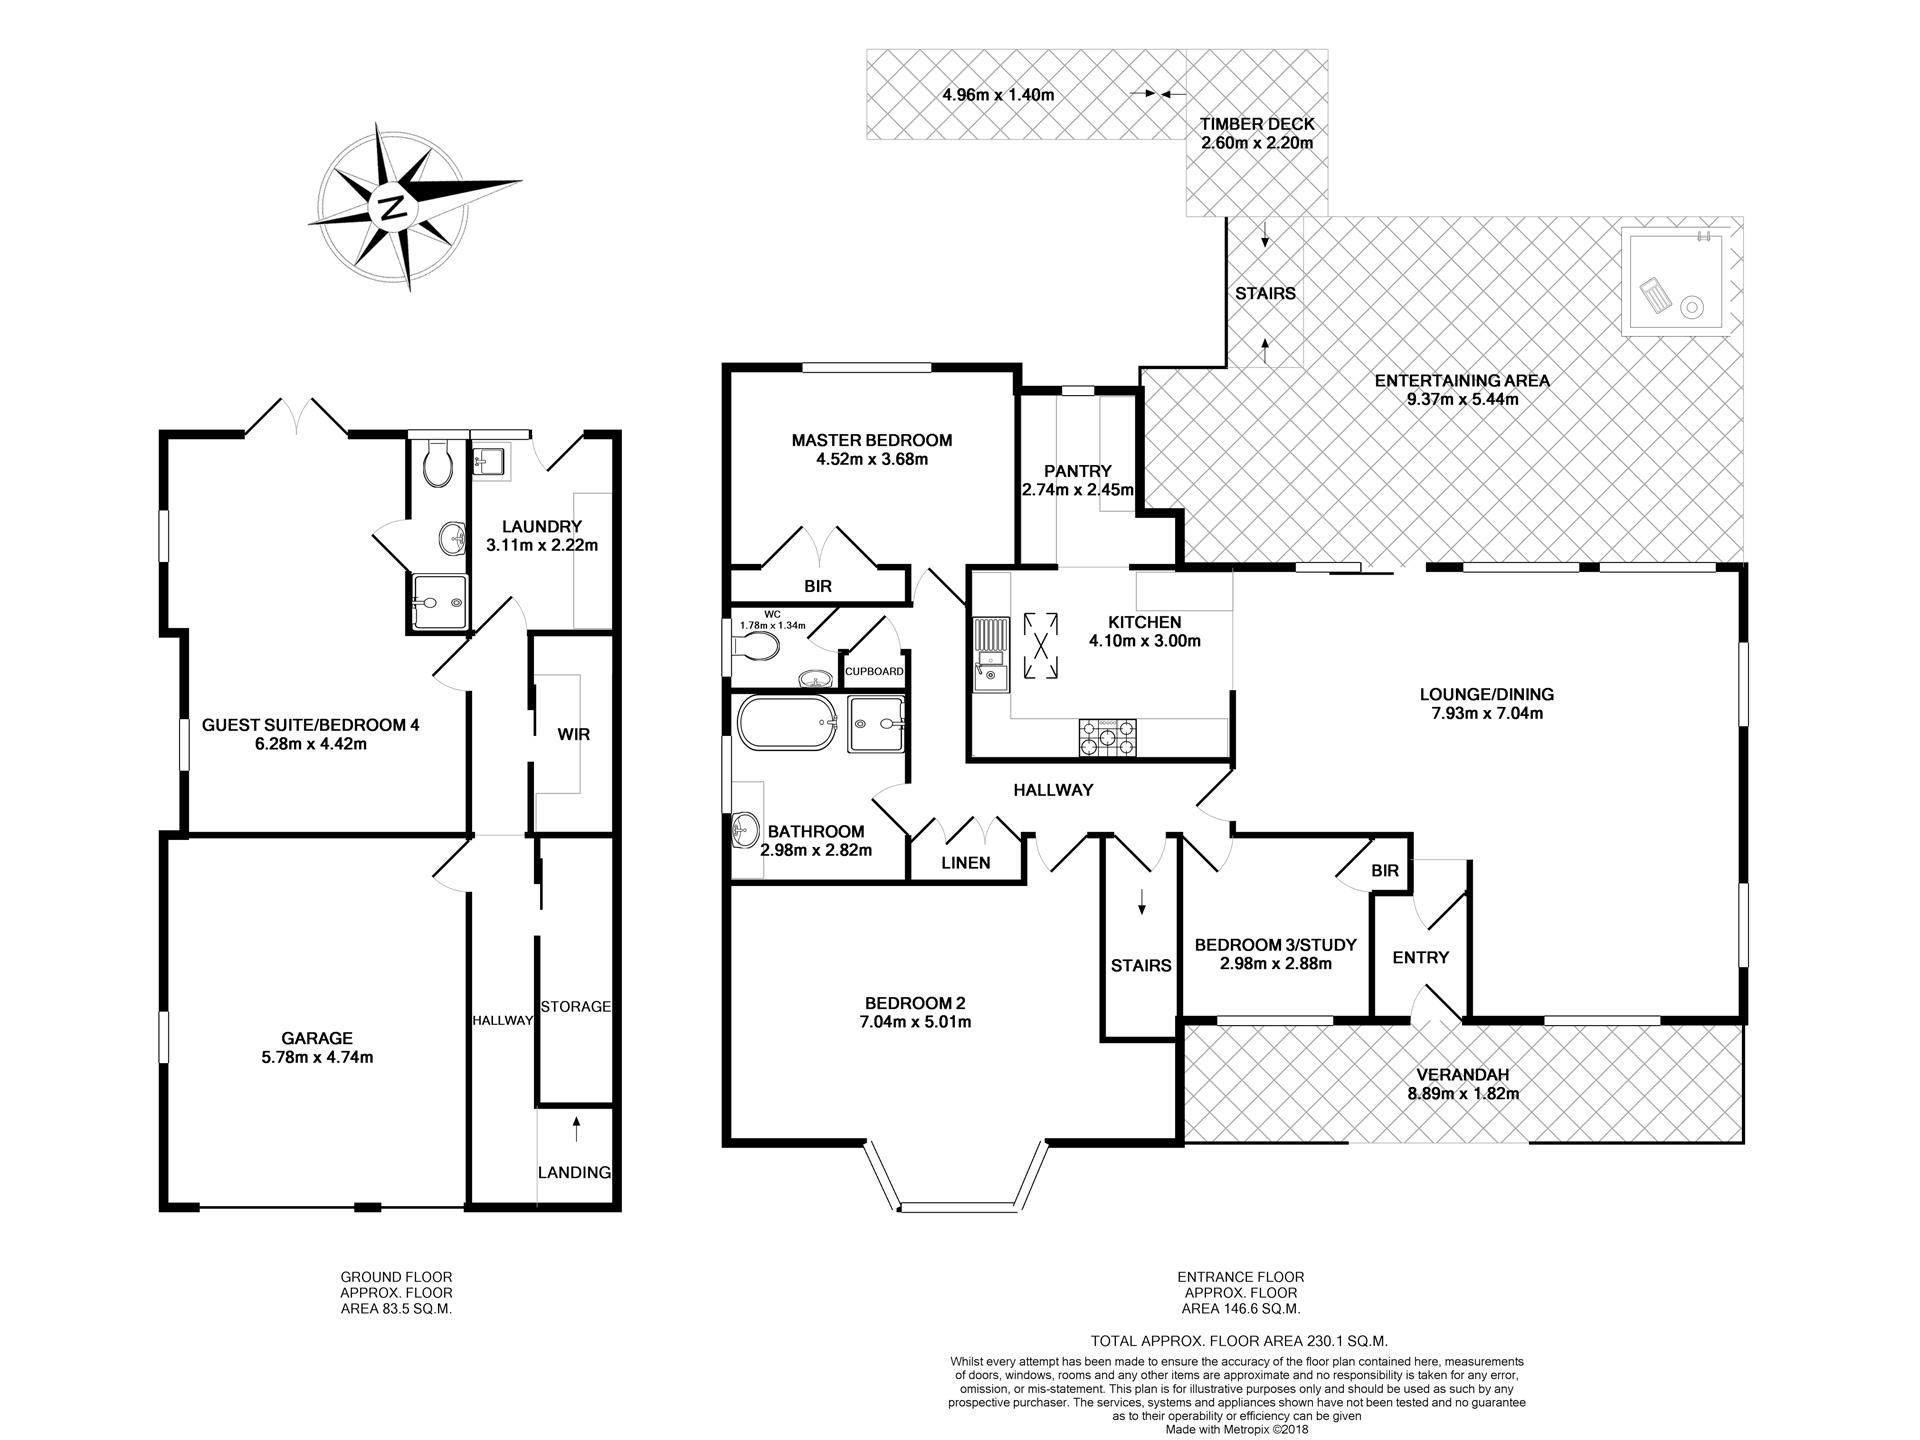 https://assets.boxdice.com.au/duncan_hill_property/listings/1768/99e6a4b8.jpg